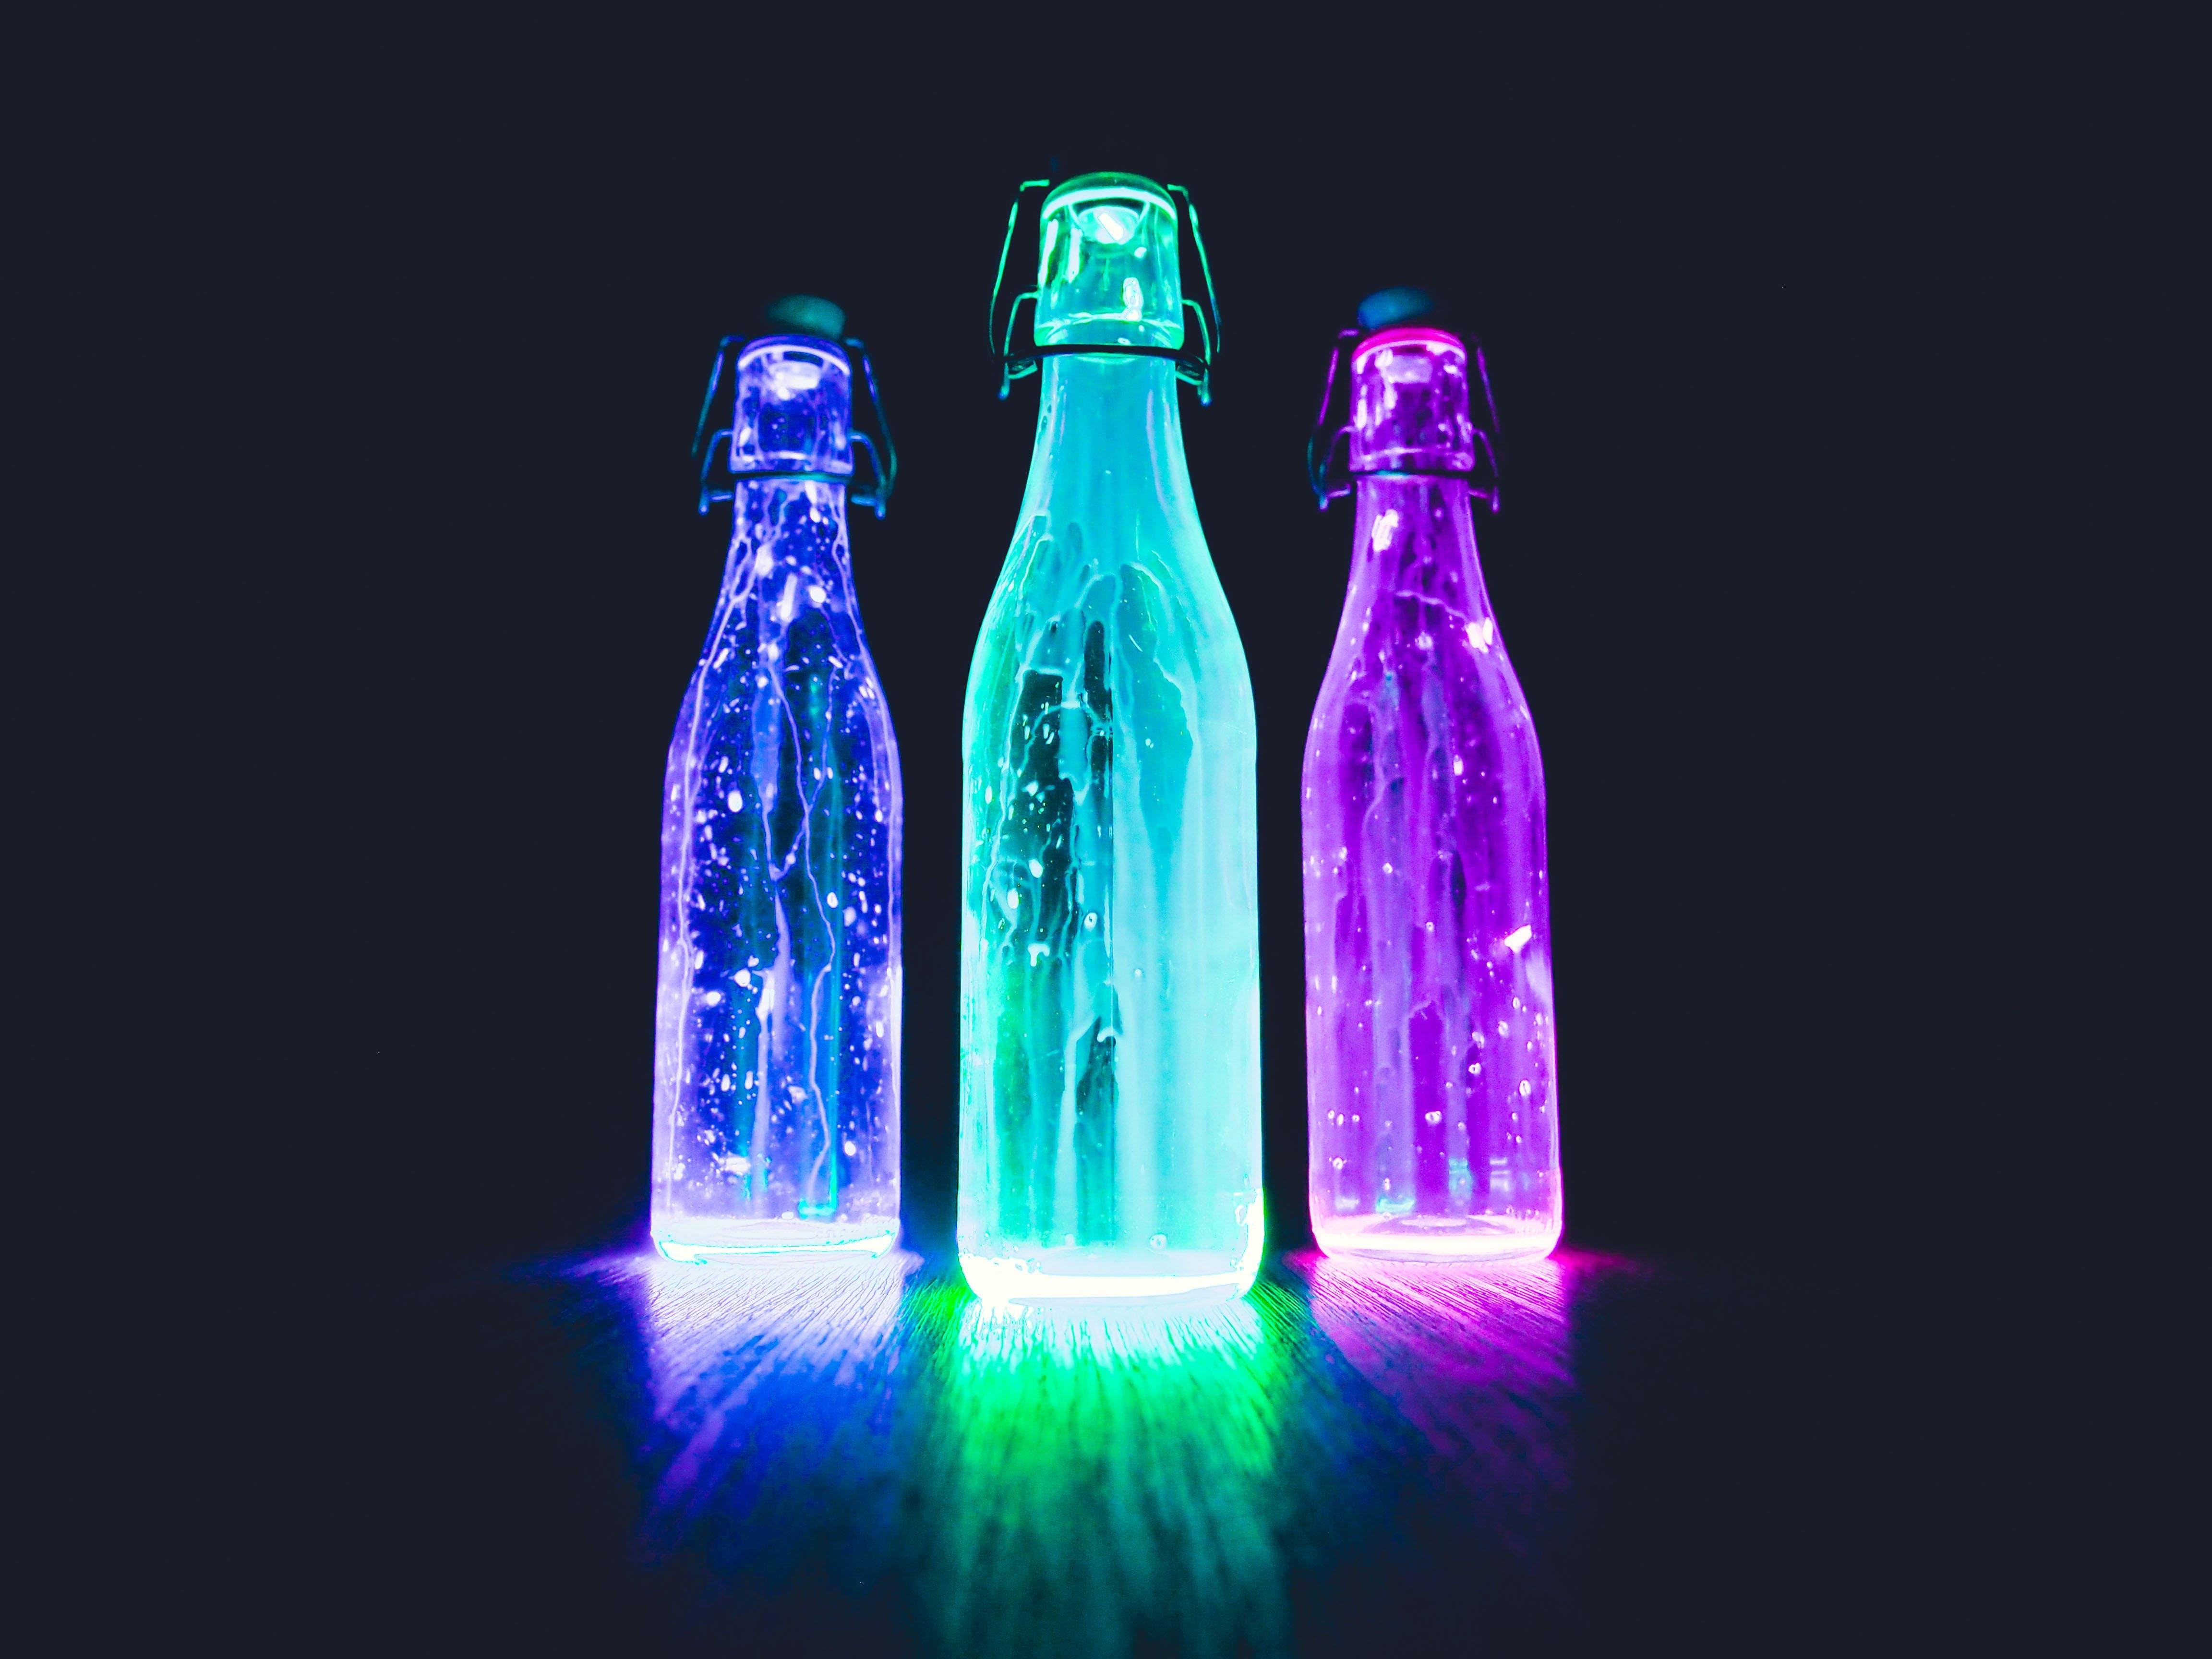 Three Lightened Bottles